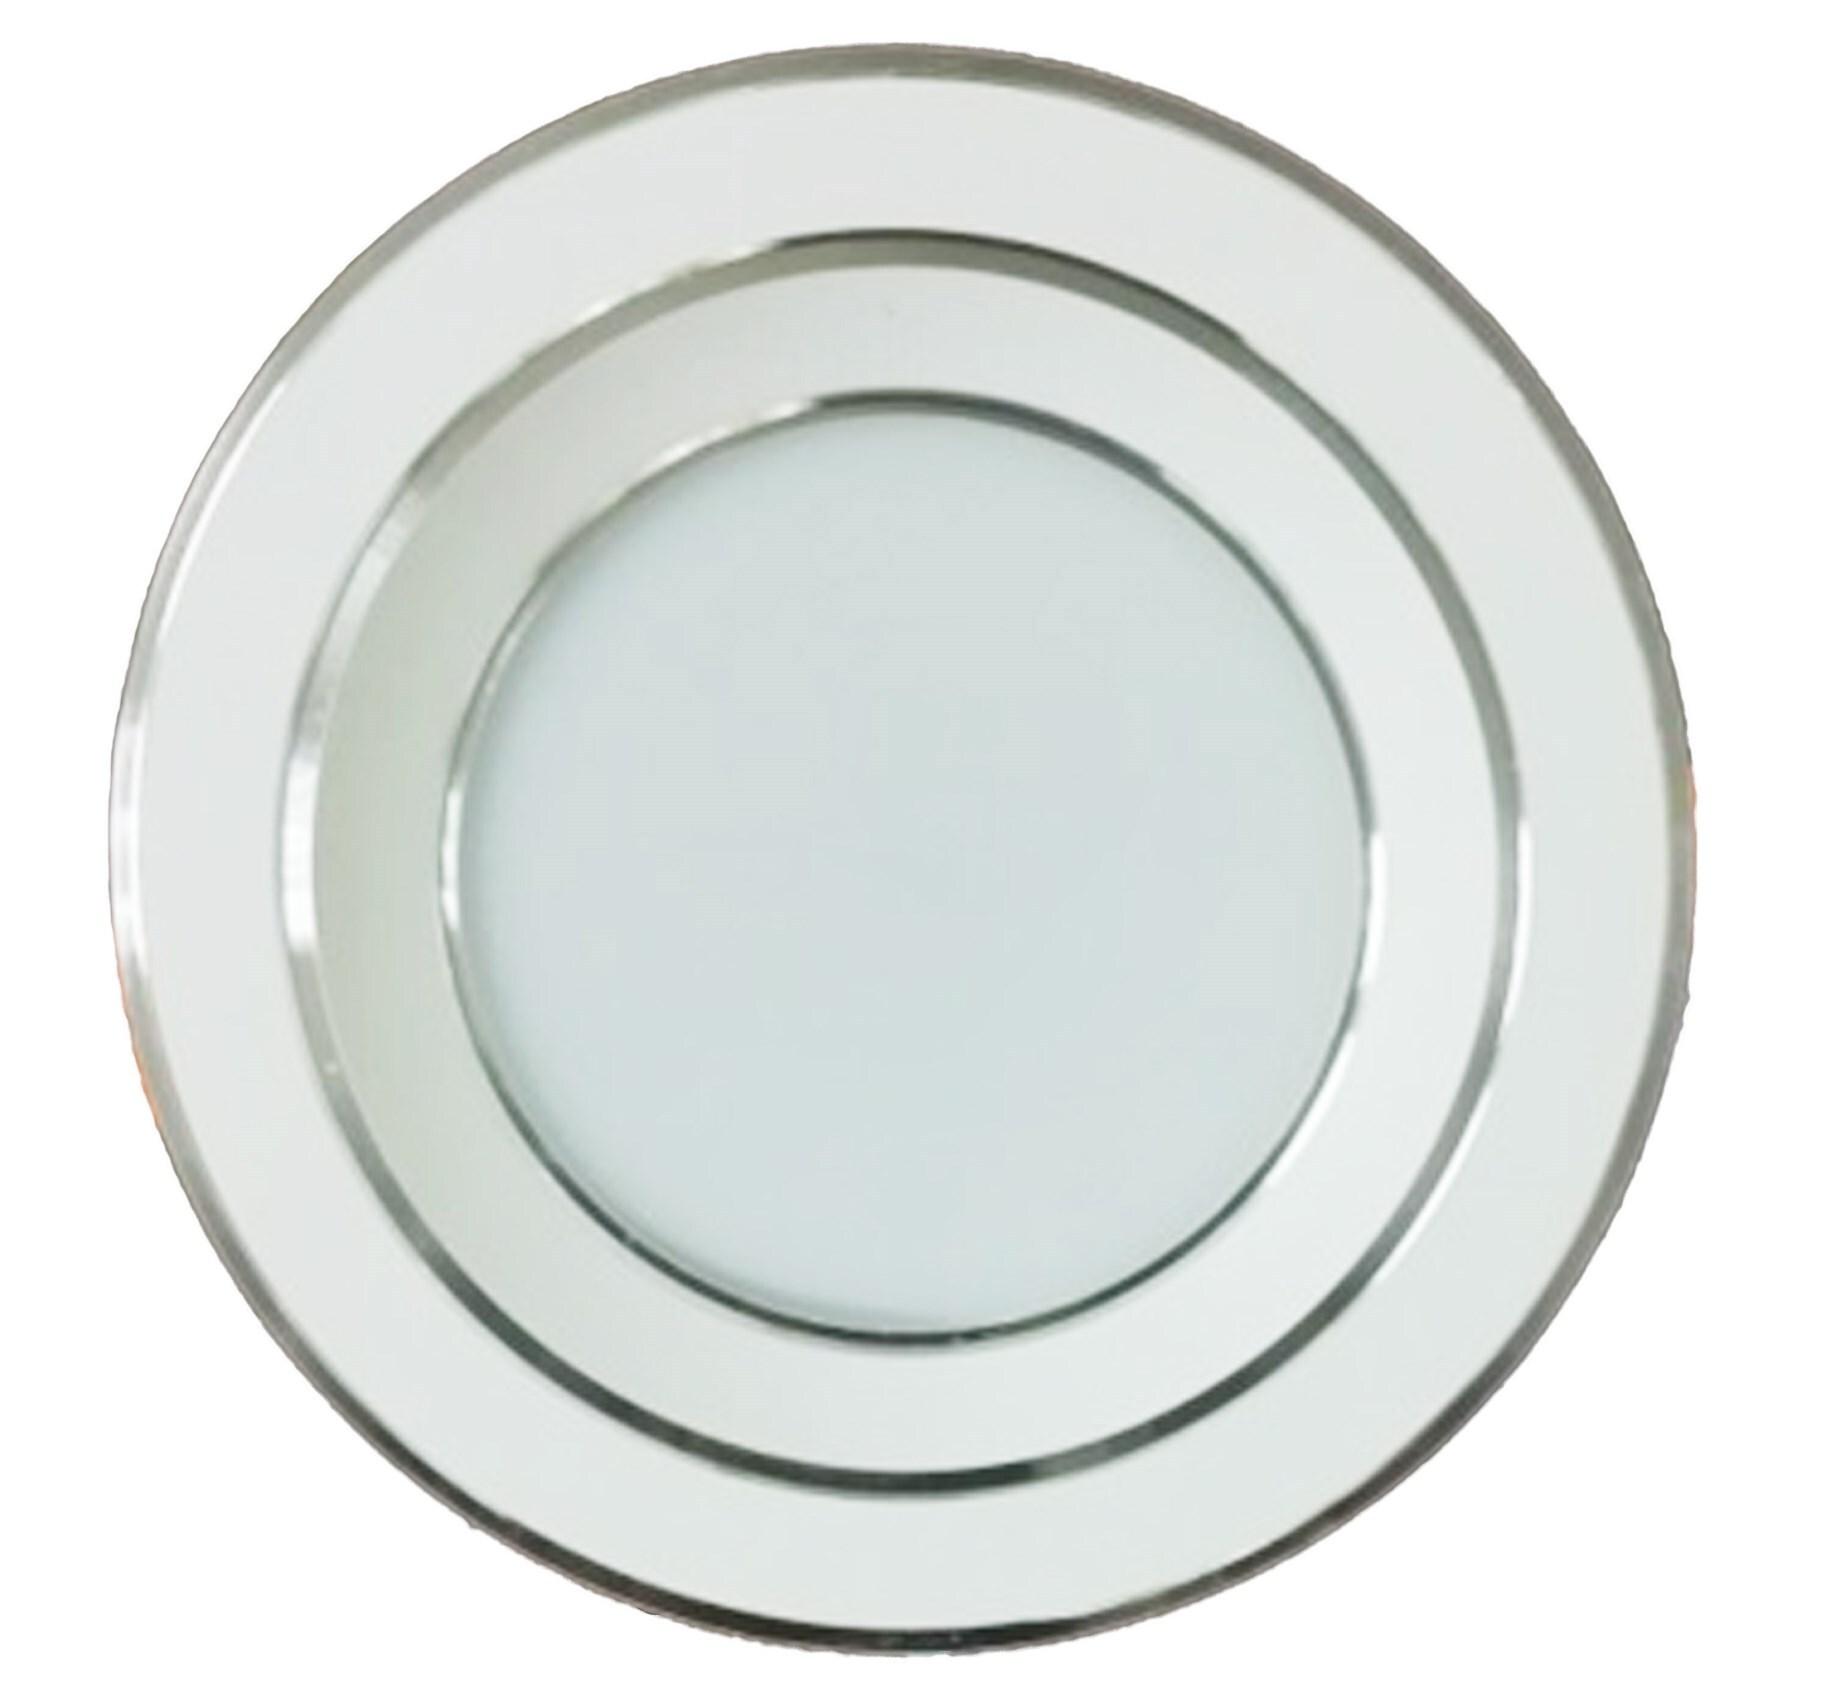 Светильник Villagio Dld134-C1 7W Led 6000K бел/хром